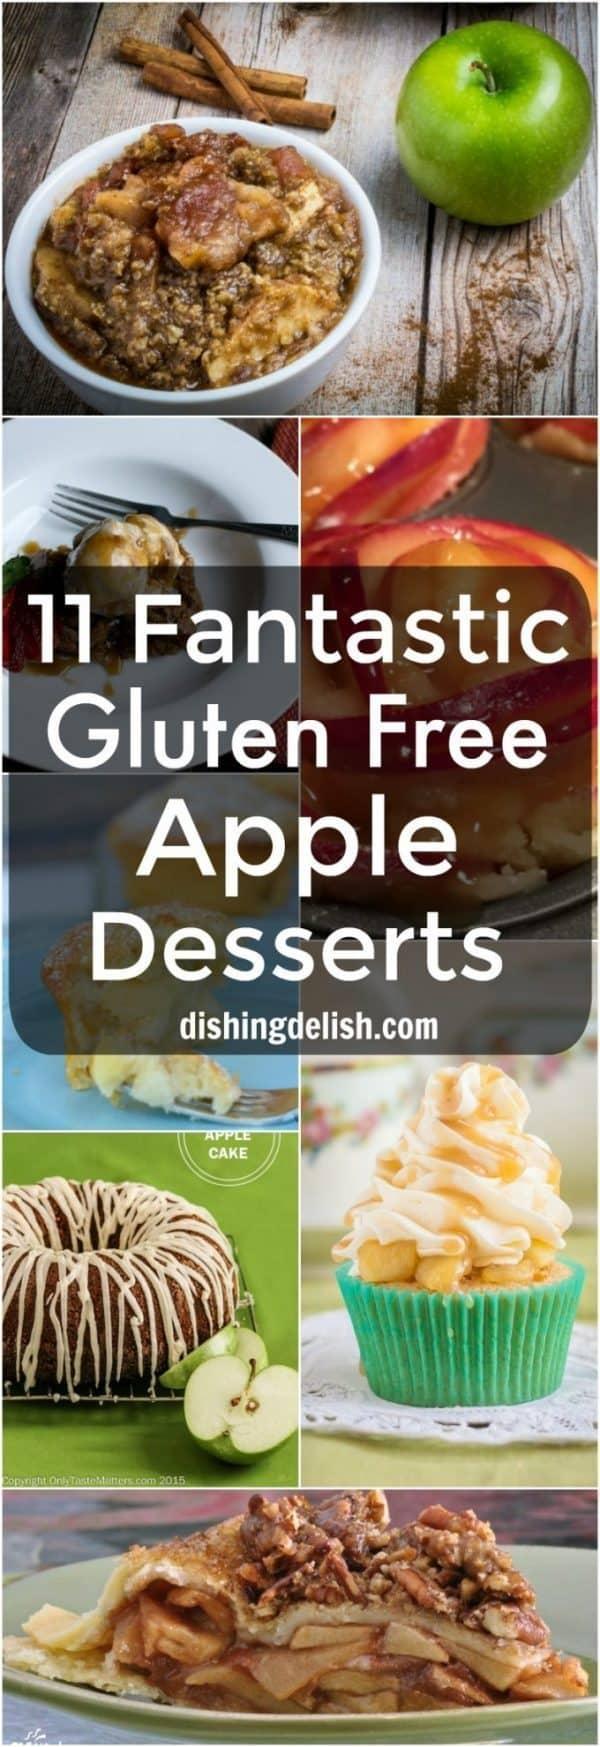 11 Fantastic Gluten Free Apple Desserts